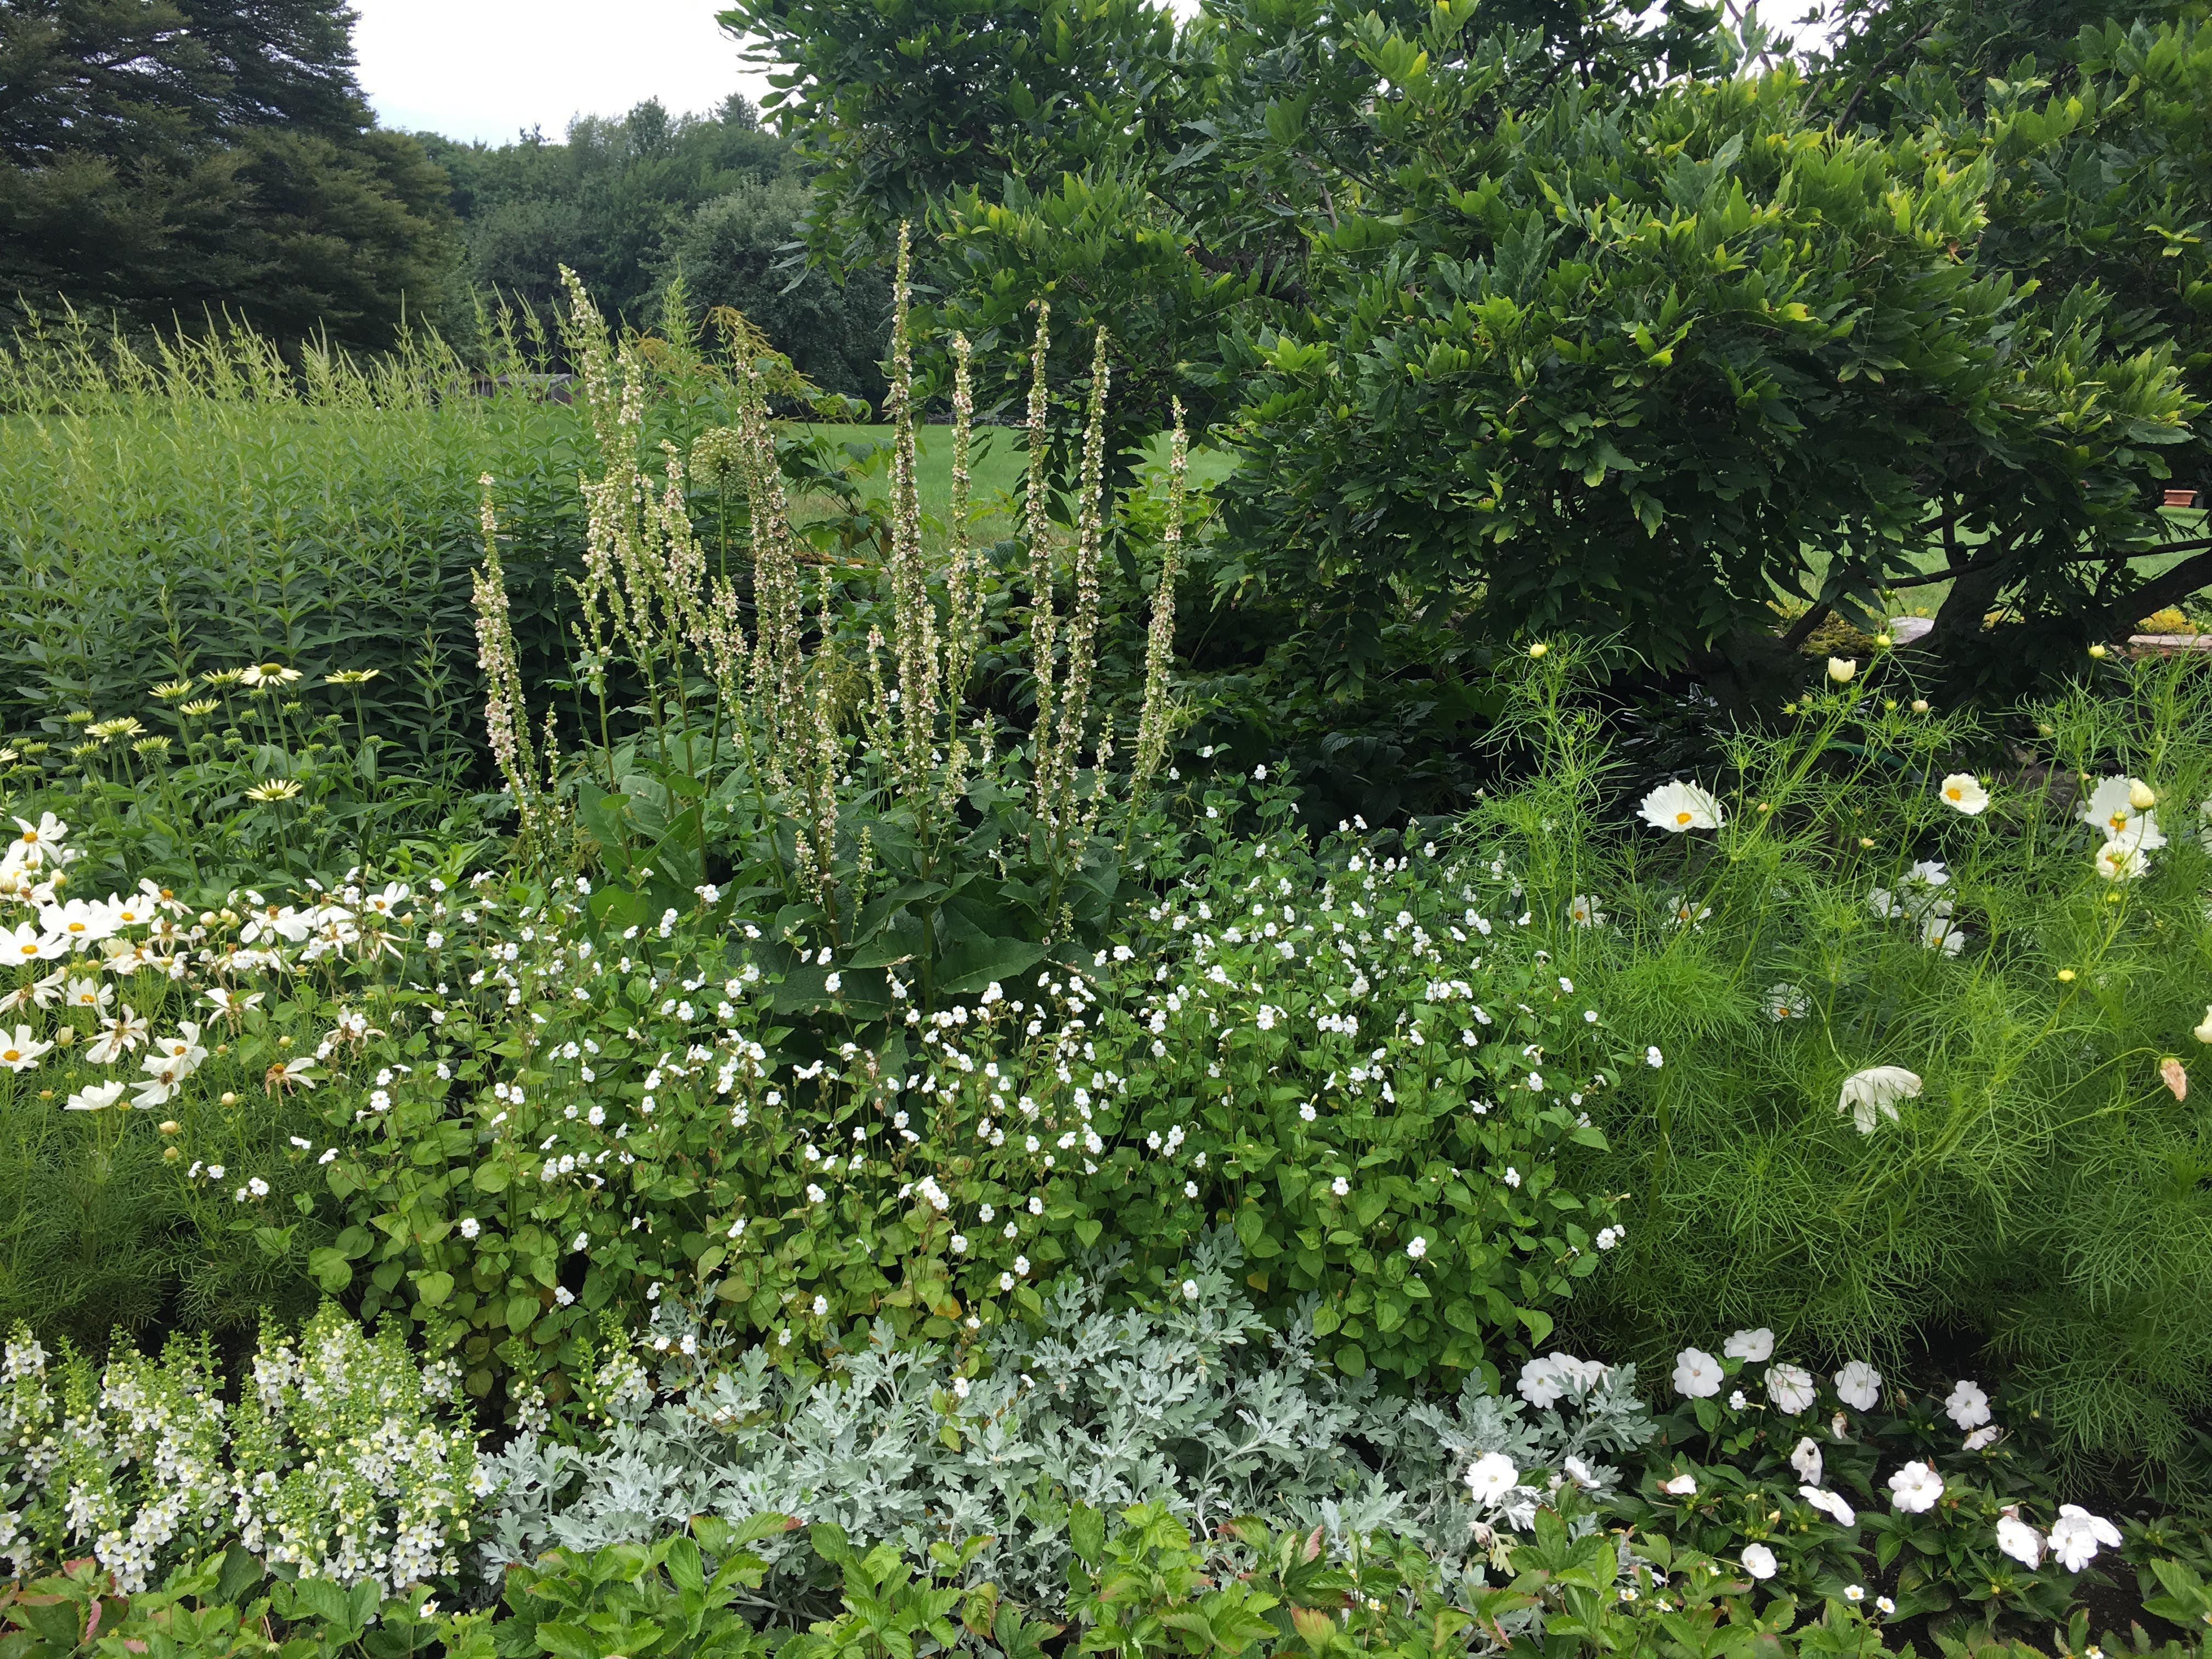 The white perennial border moon garden at white flower farm the white perennial border moon garden at white flower farm more at thinkingoutsidetheboxwood mightylinksfo